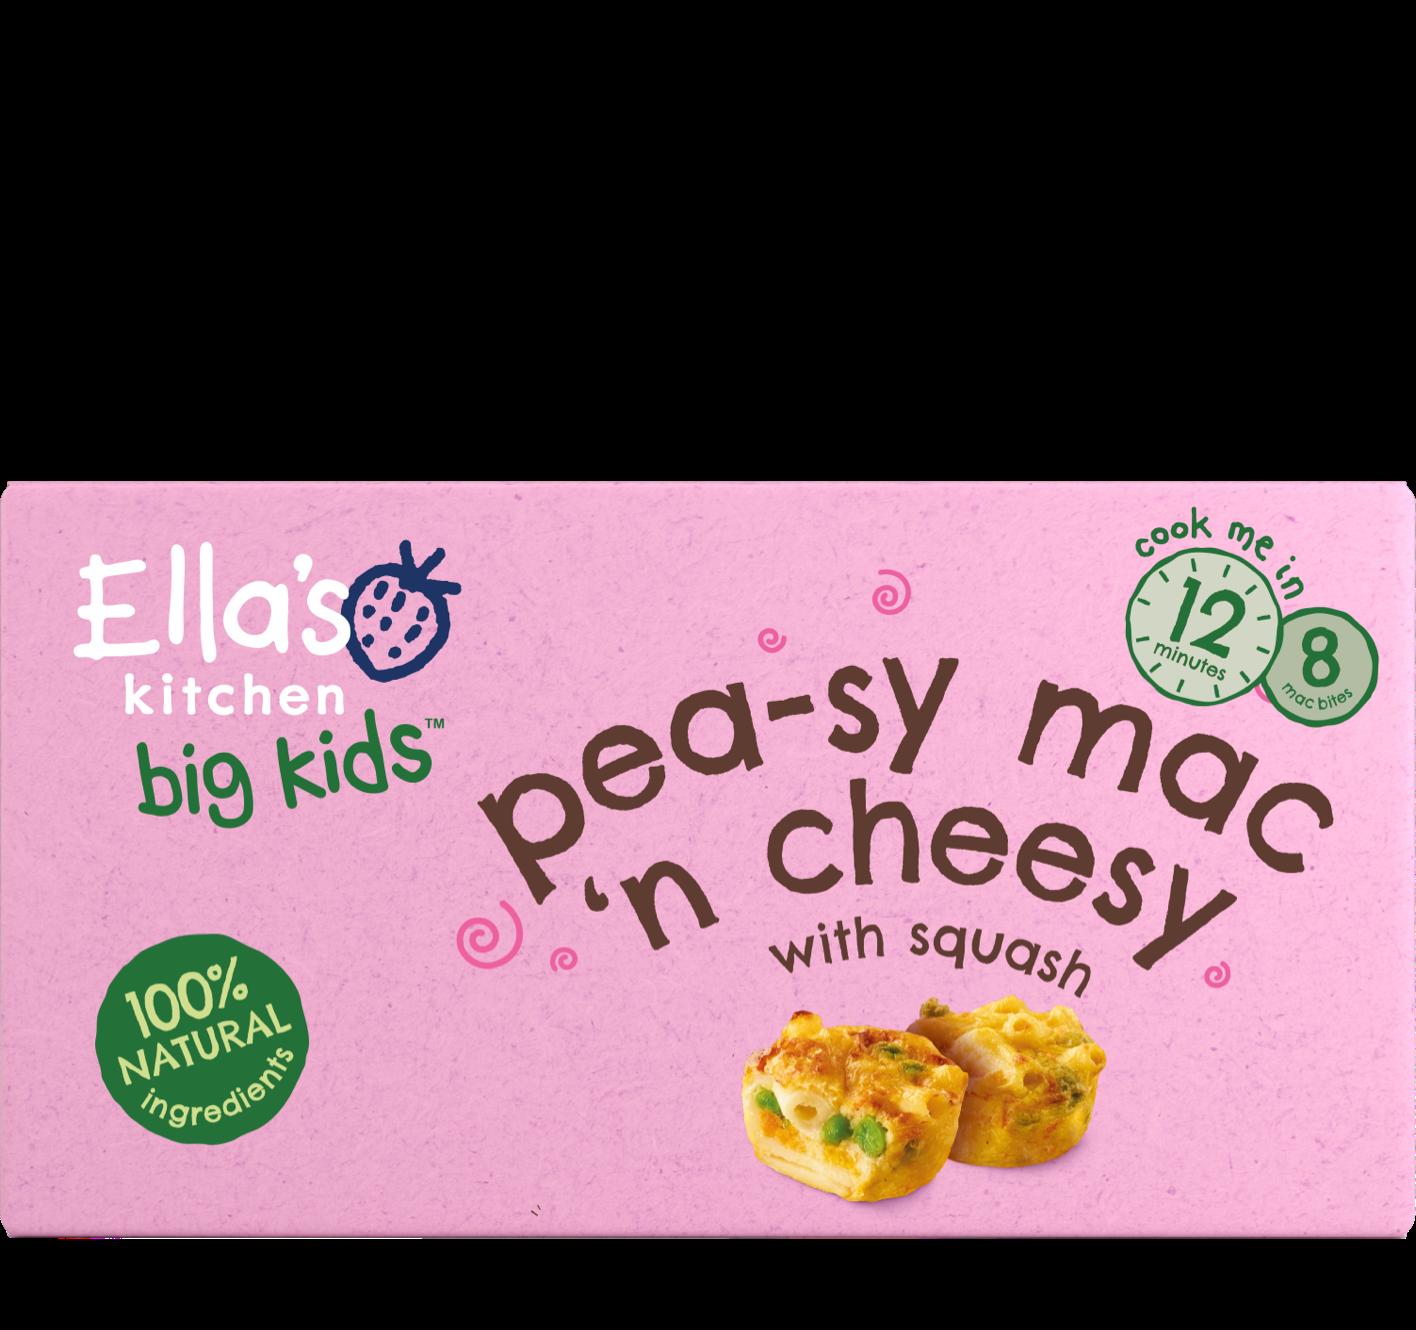 Ellas kitchen peasy mac cheese frozen front of pack 3